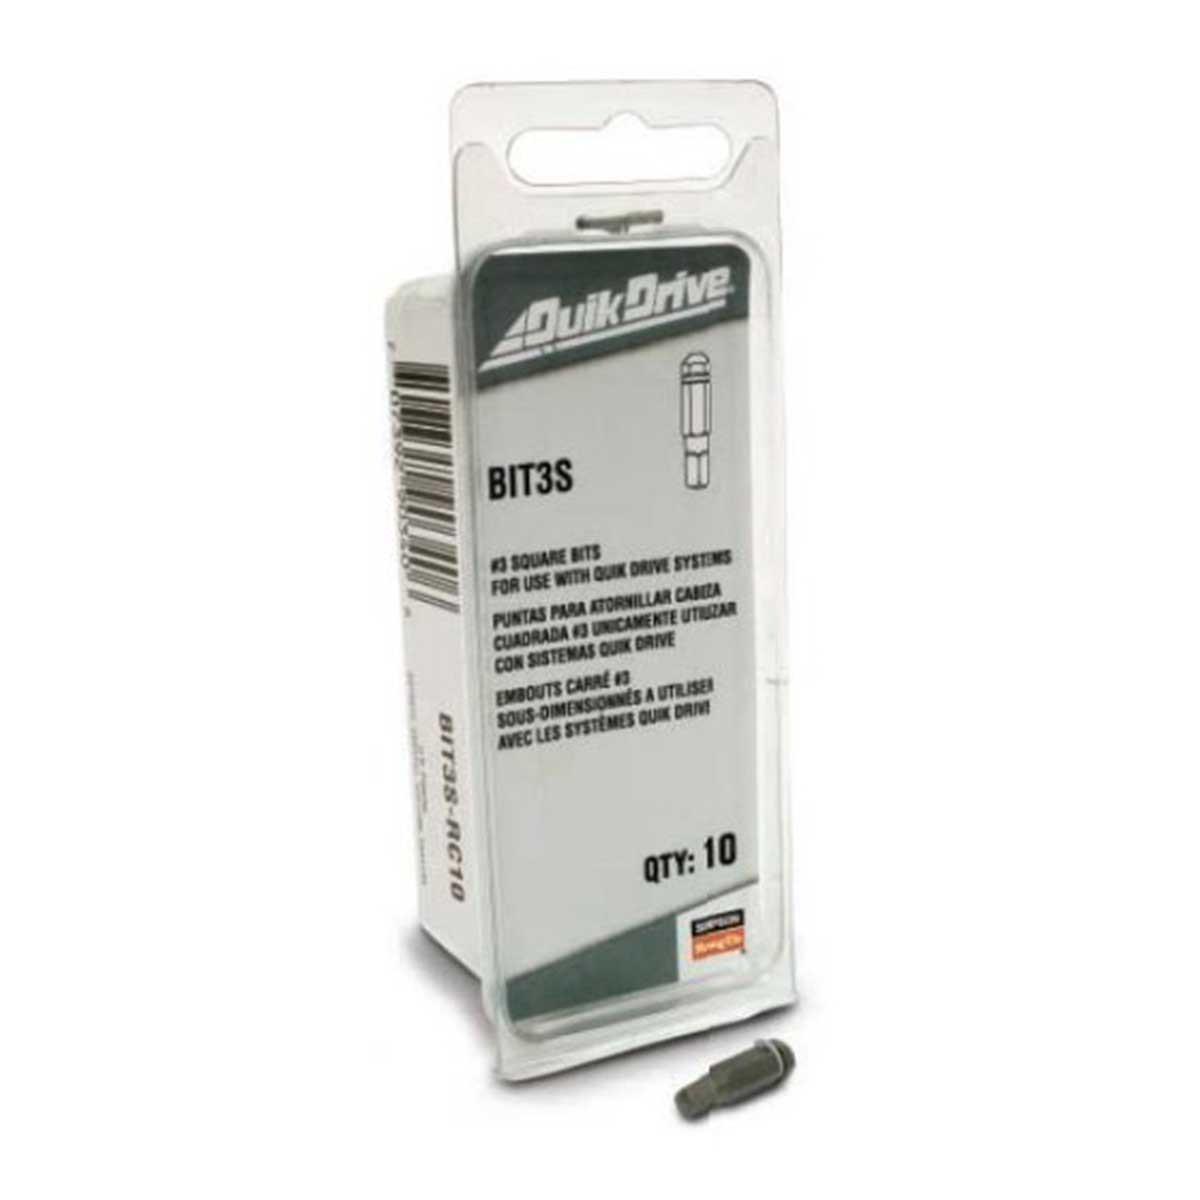 BIT3S-RC10 Quik Drive #3 Bit Pack 10 Pack